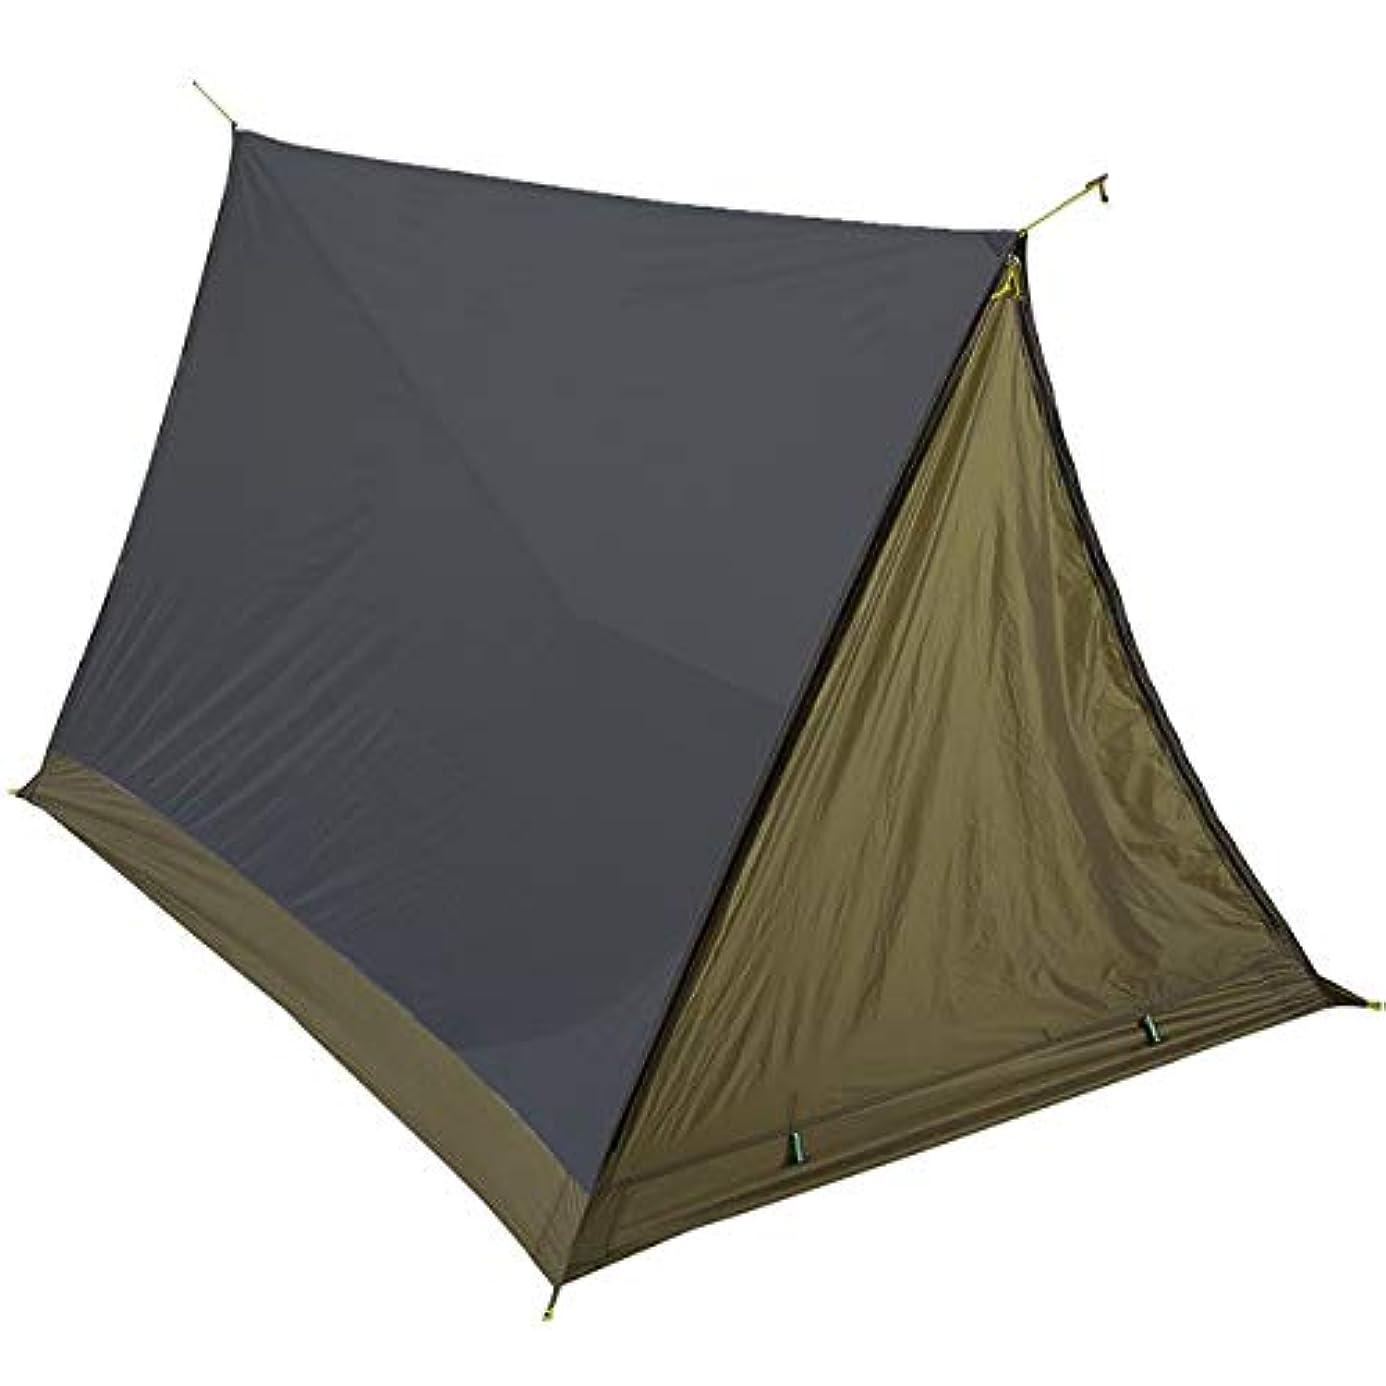 OneTigris SEA Mist Screen Tent, Ultralight Mesh Tent